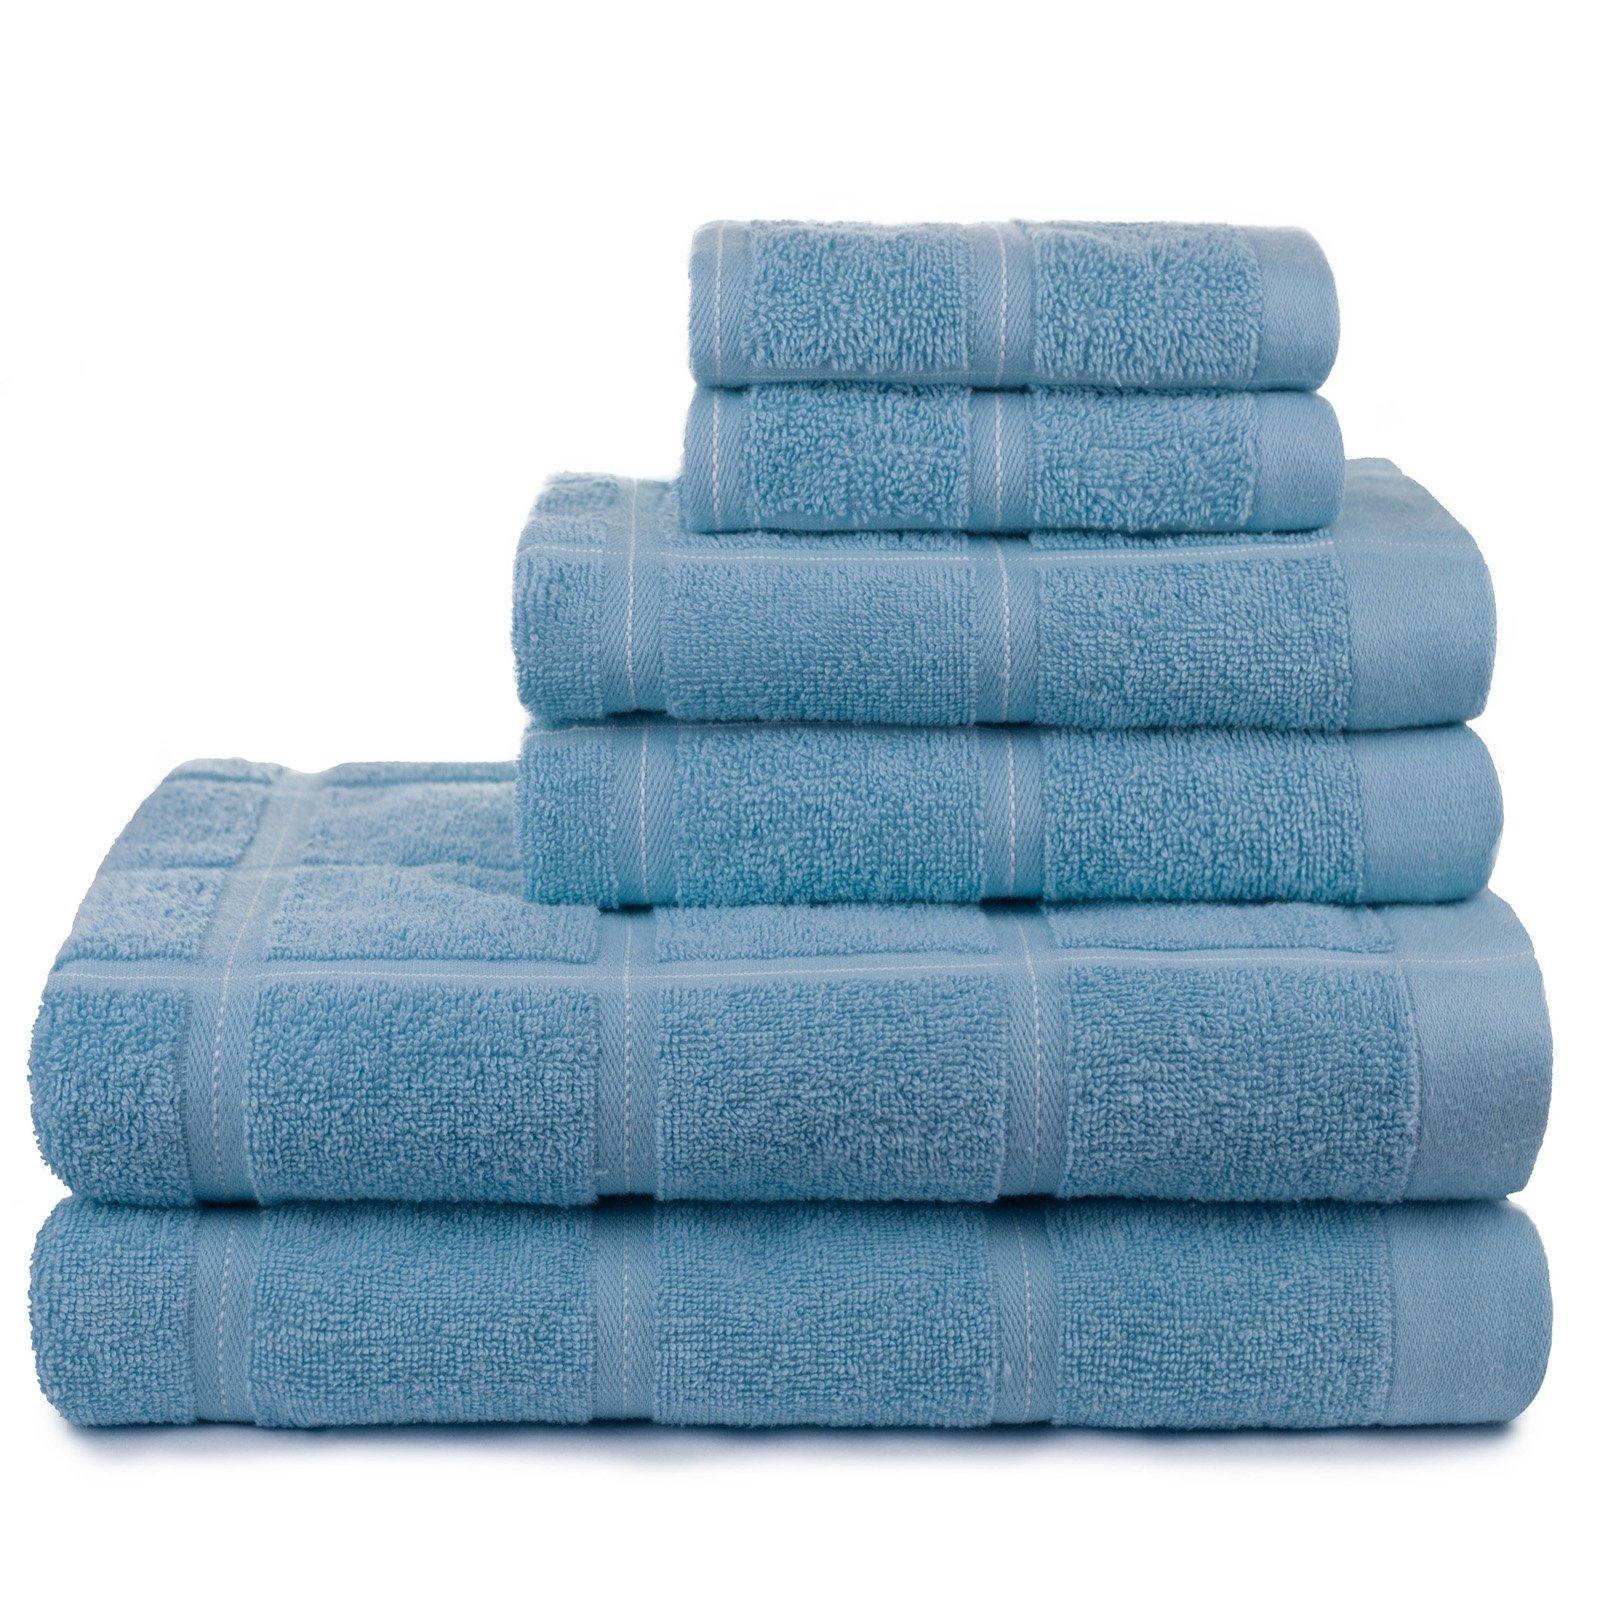 American Dawn Kempster 6 Piece Bath Towel Set Dusk Blue Towel Set Bath Towel Sets Bath Towels